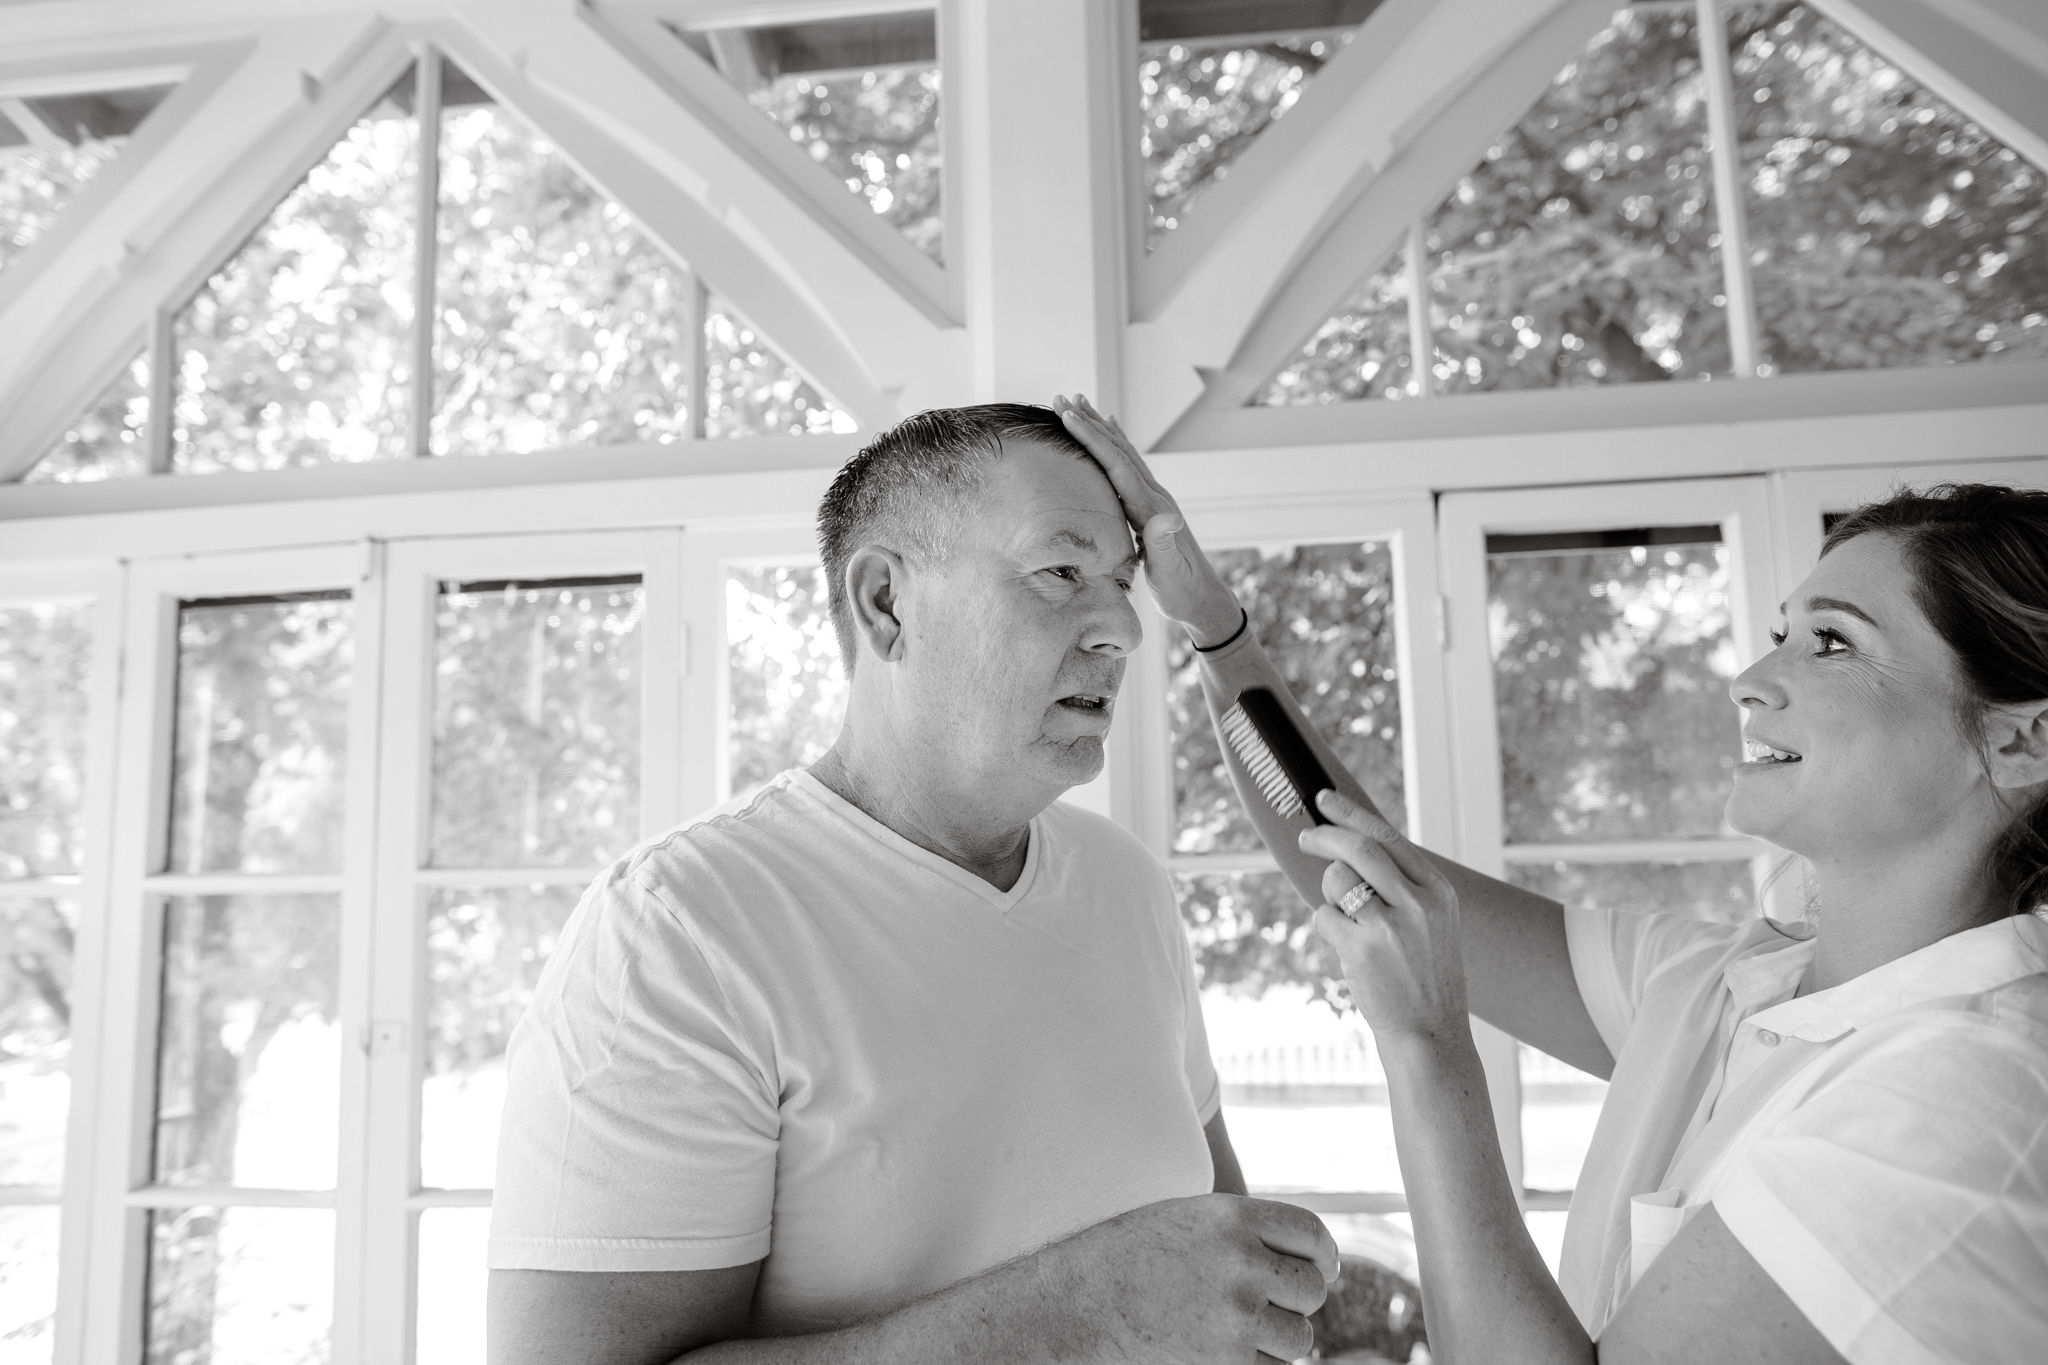 maine-farm-wedding-photographer-stepheneycollins-3b.jpg